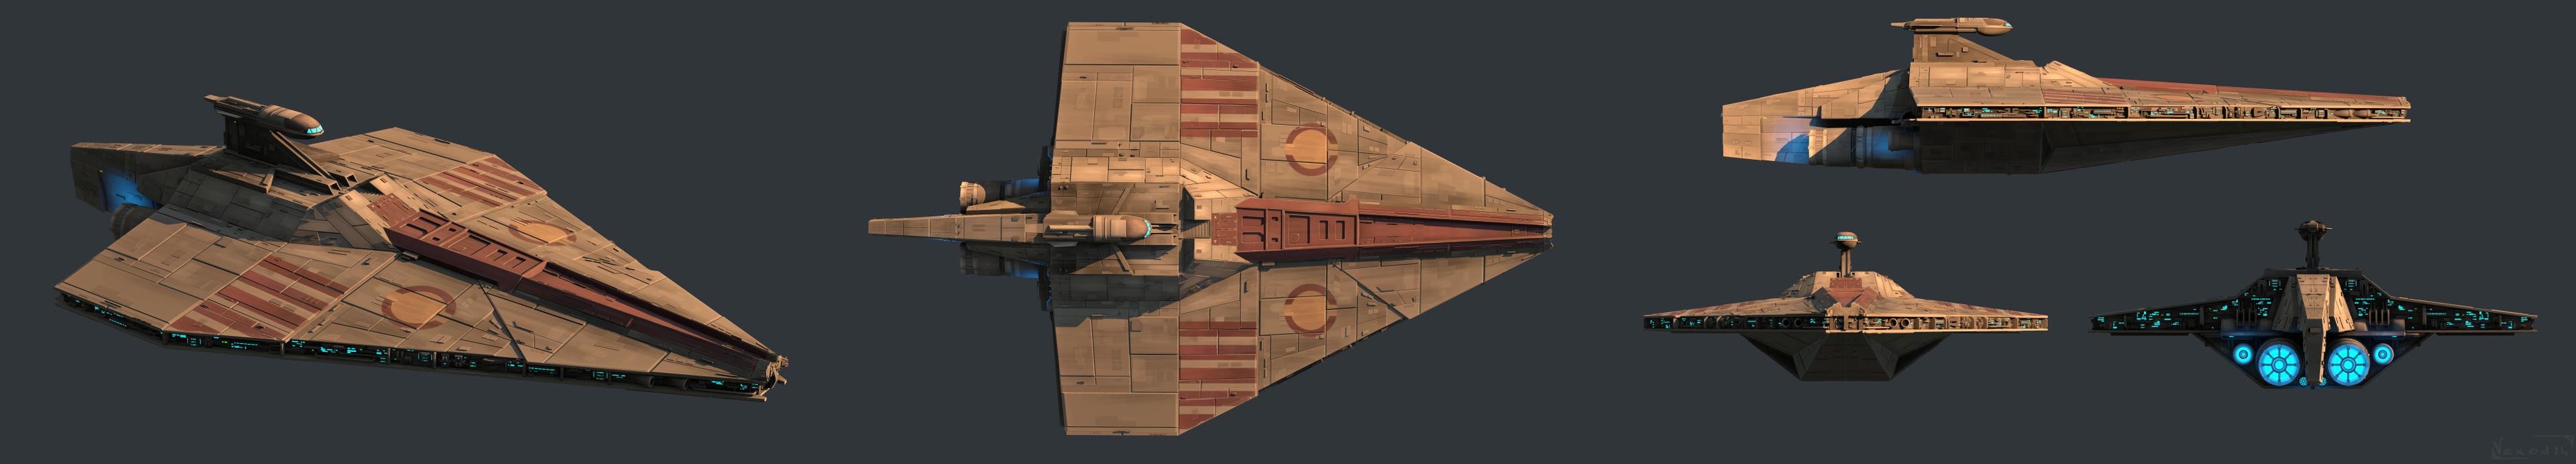 Acclamator Class Star Destroyer